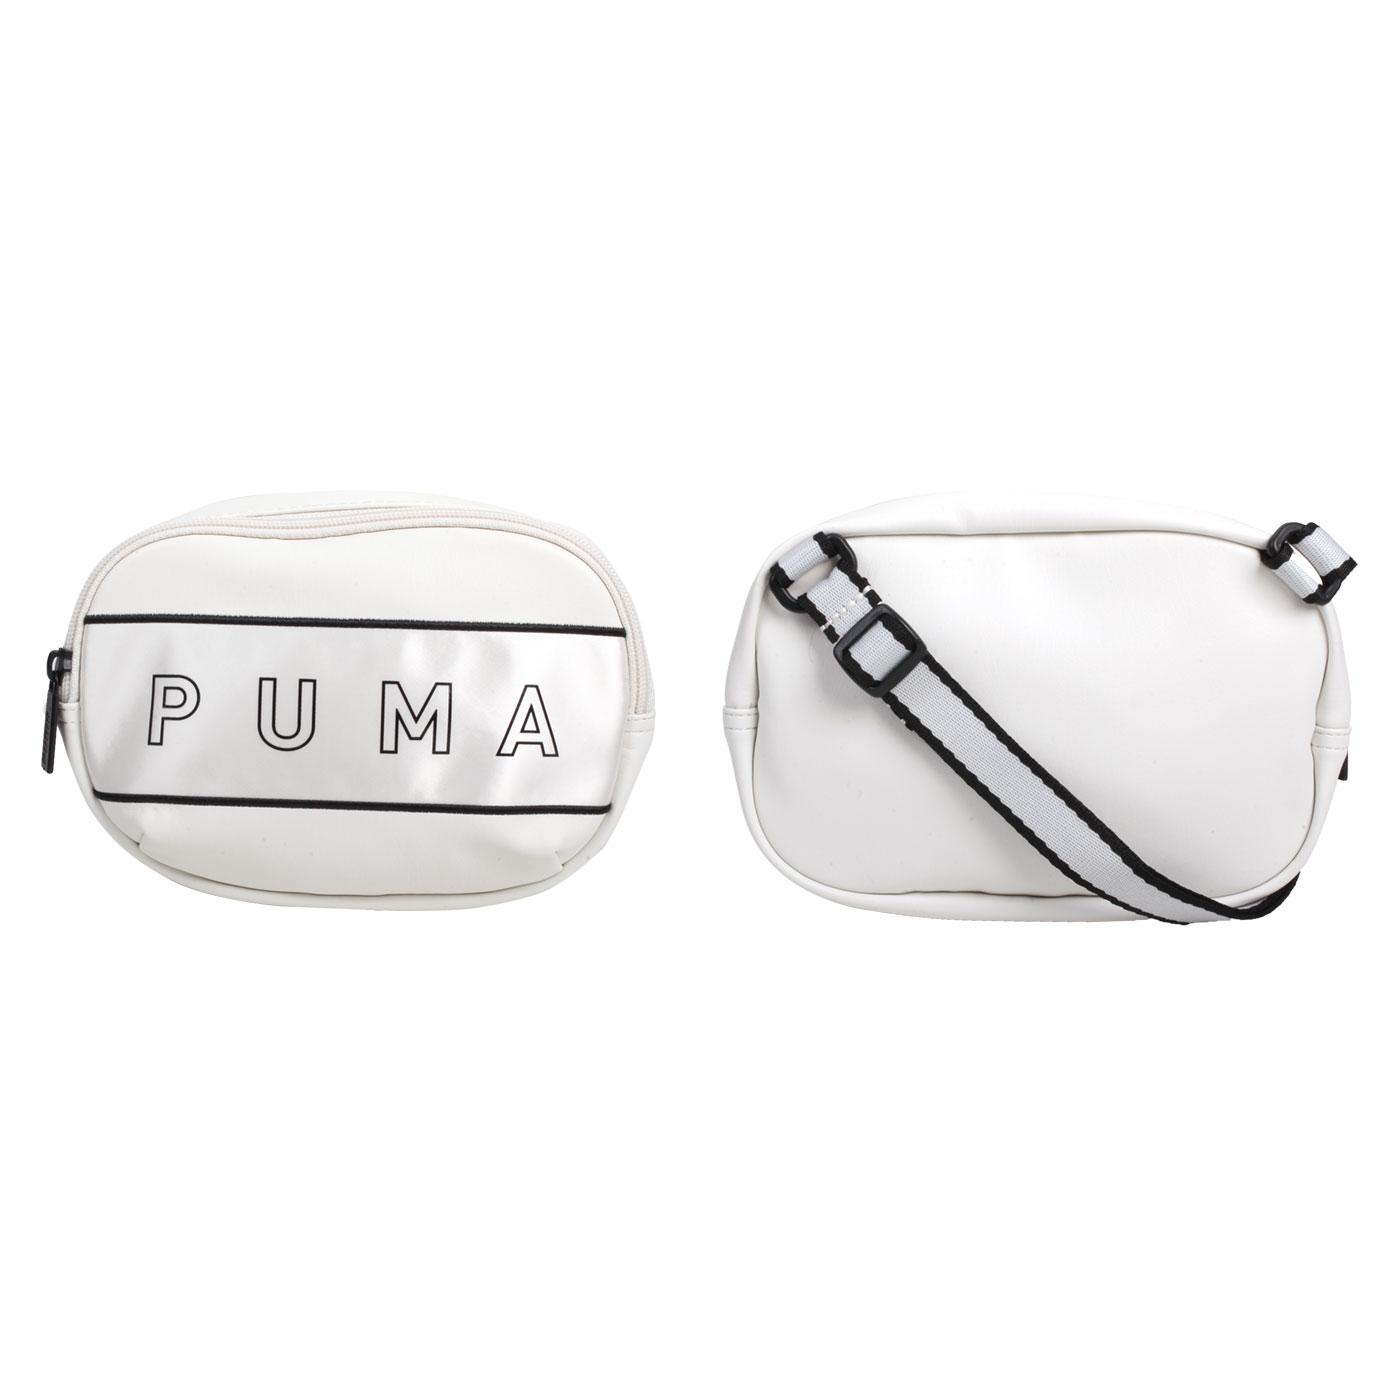 PUMA 側背小包 07739102